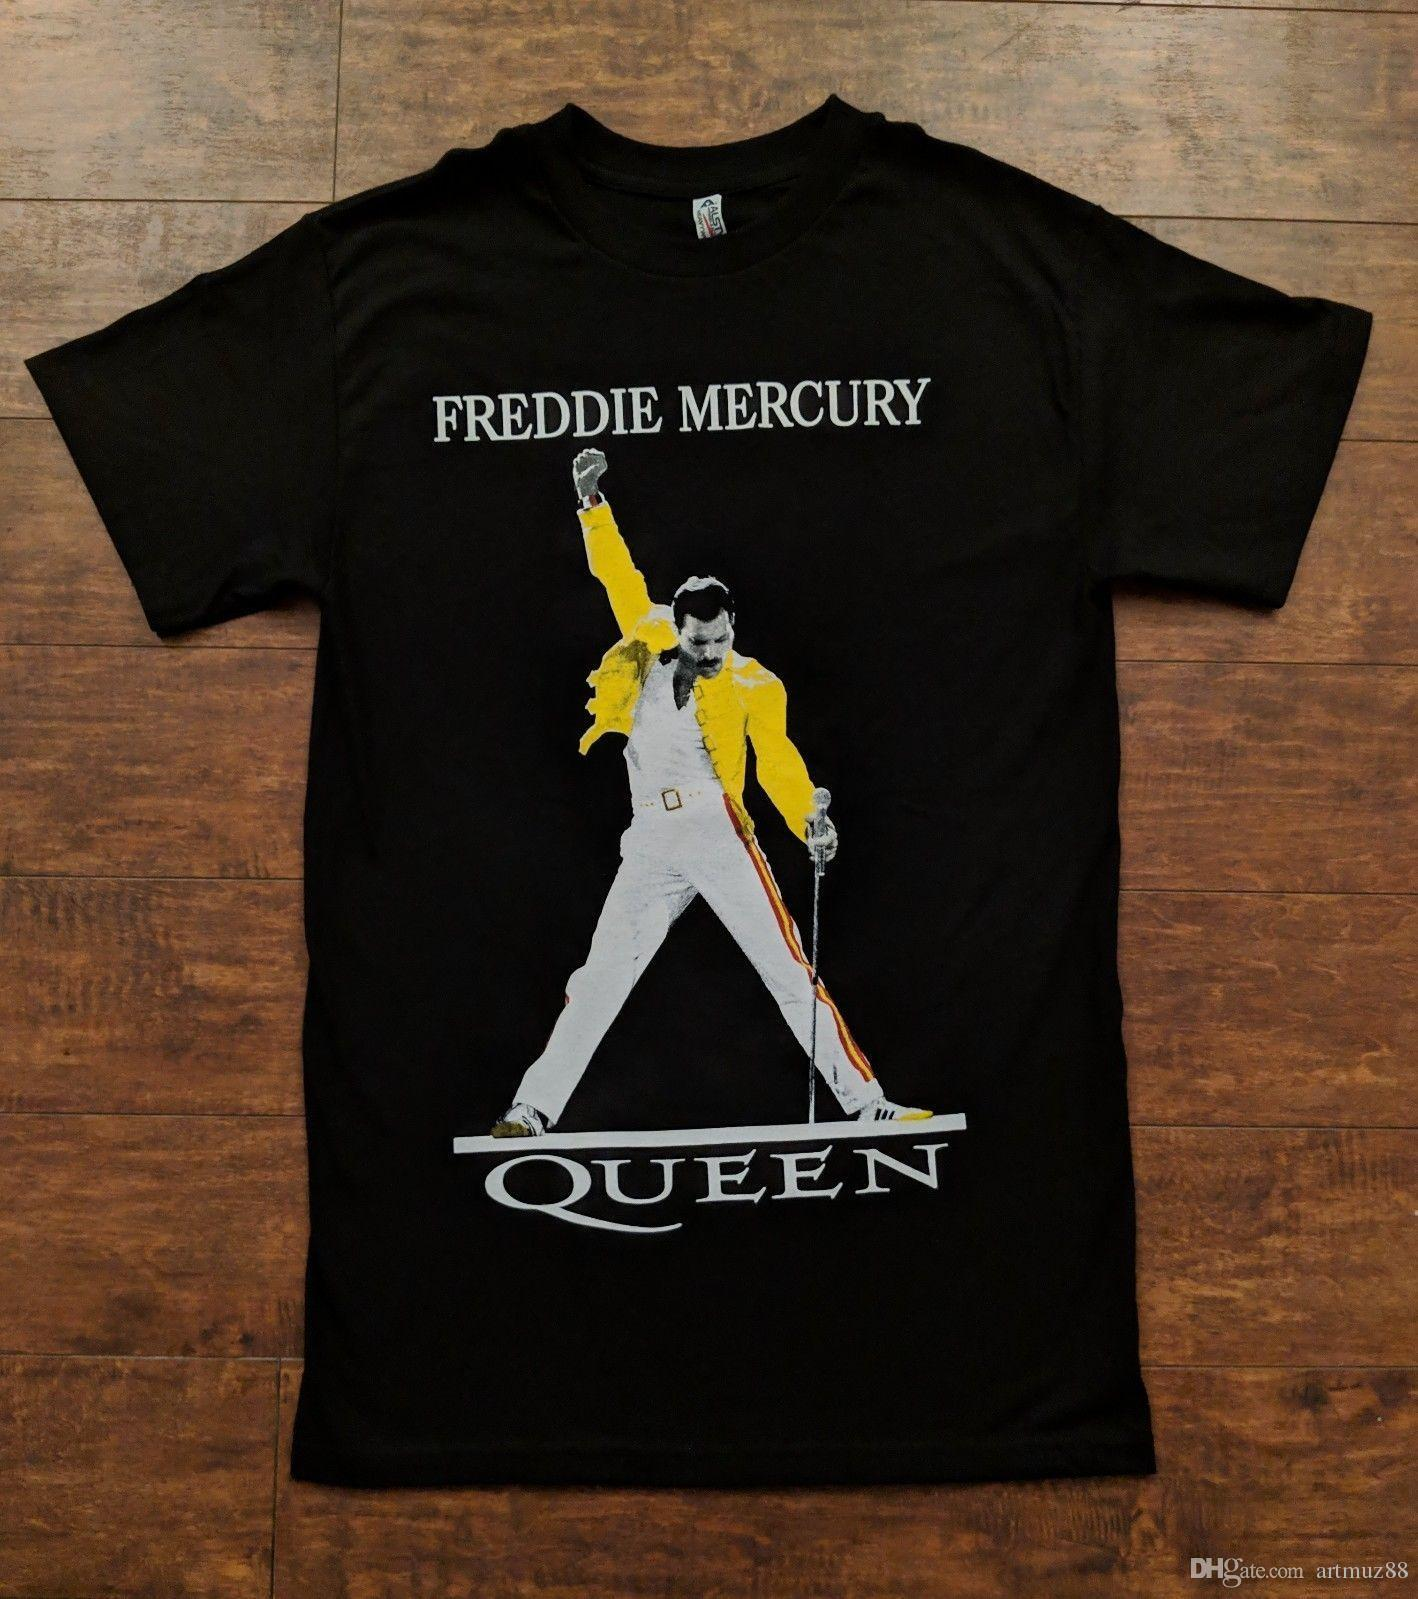 086a3162d QUEEN BAND FREDDIE MERCURY YELLOW JACKET LEGENDARY POSE Black TSHIRT K692 Shirts  T Shirts T Shirts And Shirts From Artmuz88, $10.76| DHgate.Com